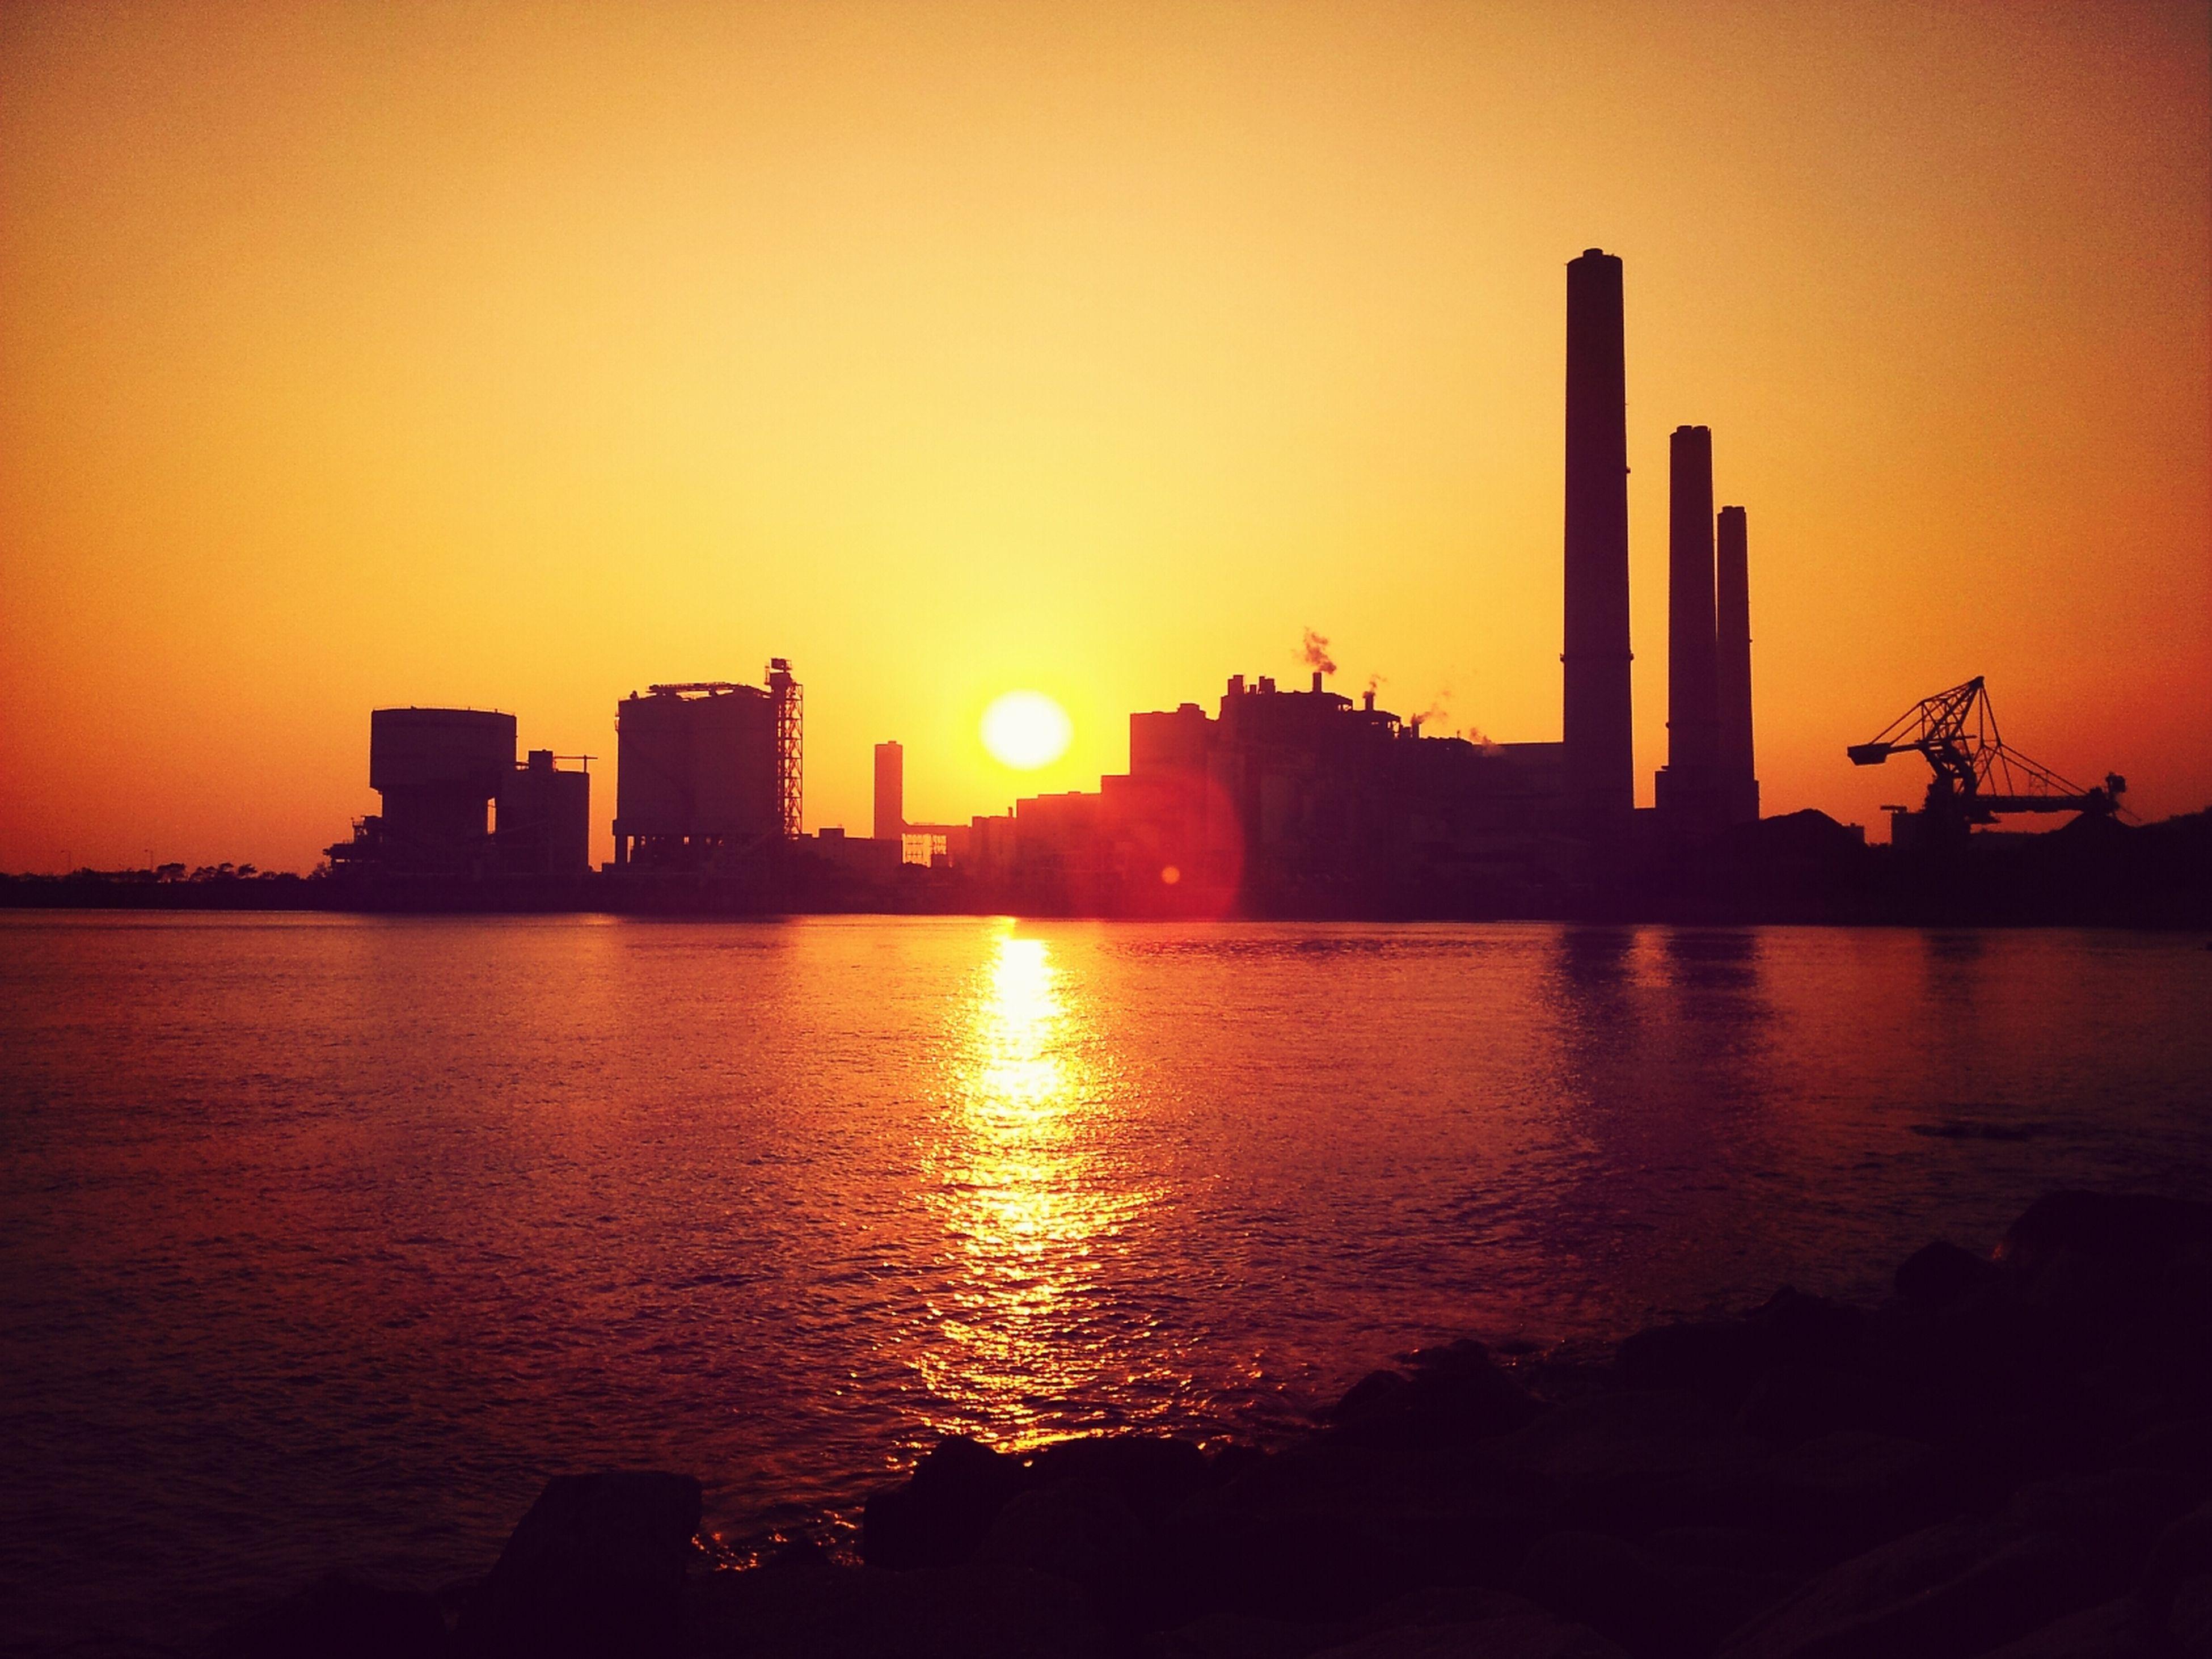 sunset, sun, architecture, building exterior, built structure, water, silhouette, orange color, city, waterfront, sea, sunlight, reflection, sky, urban skyline, tower, clear sky, development, crane - construction machinery, skyscraper